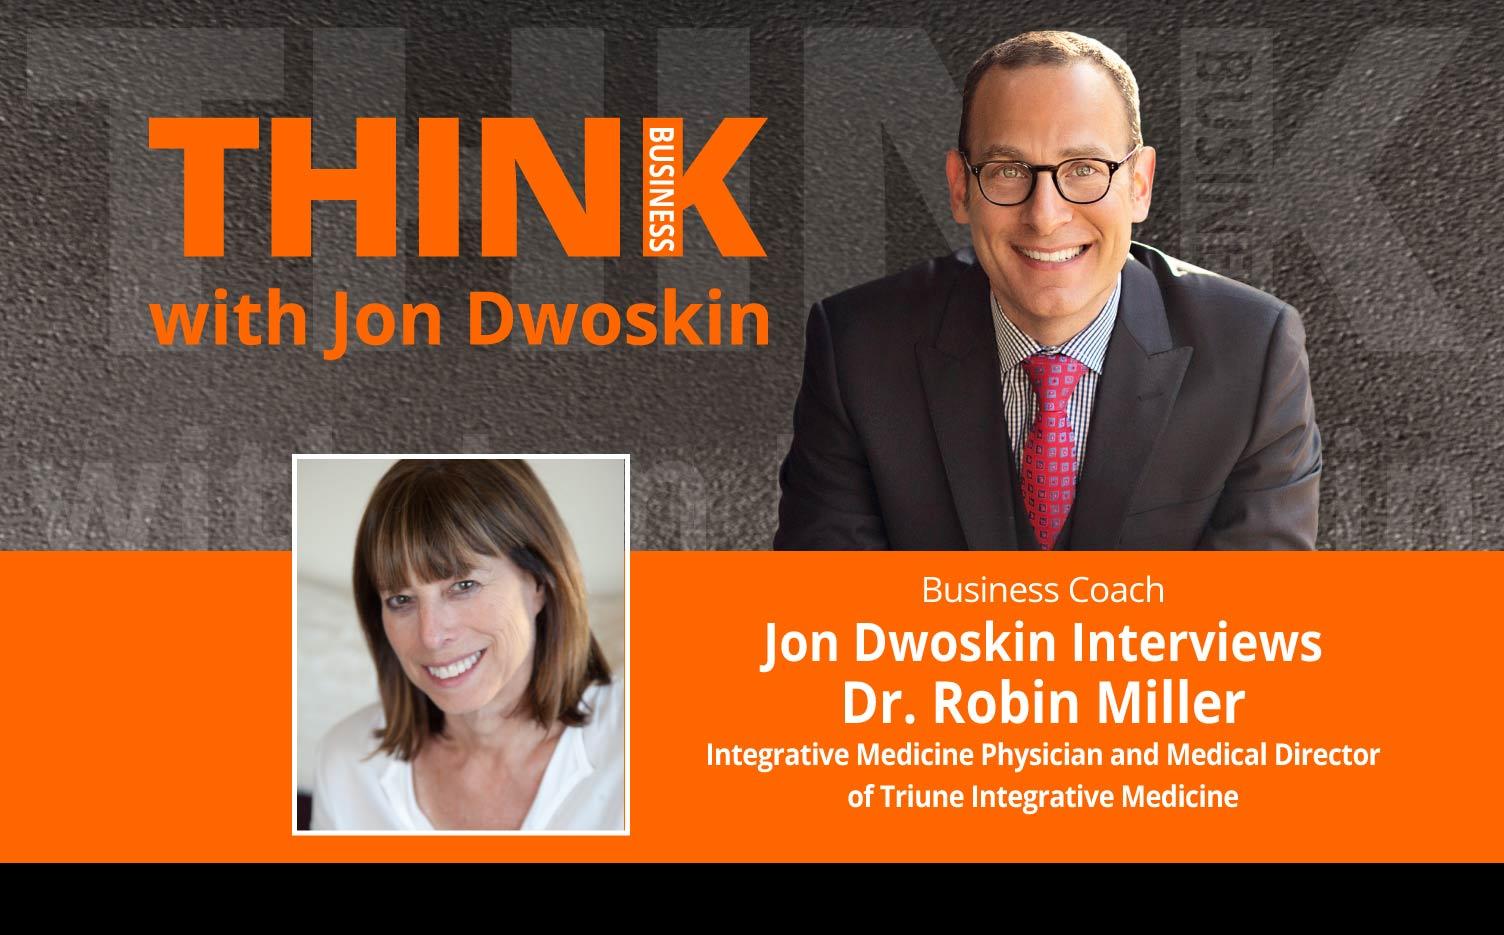 THINK Business Podcast: Jon Dwoskin Interviews Dr. Robin Miller, Integrative Medicine Physician and Medical Director of Triune Integrative Medicine